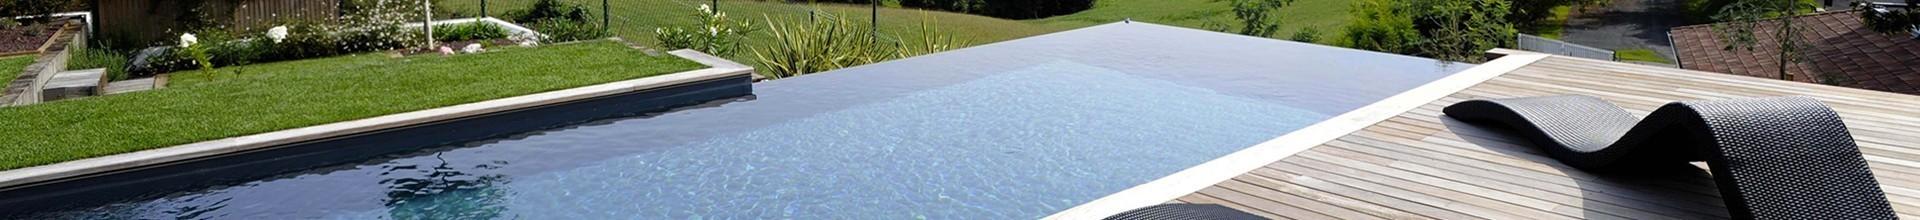 Direct usine, piscine coque prix Allier